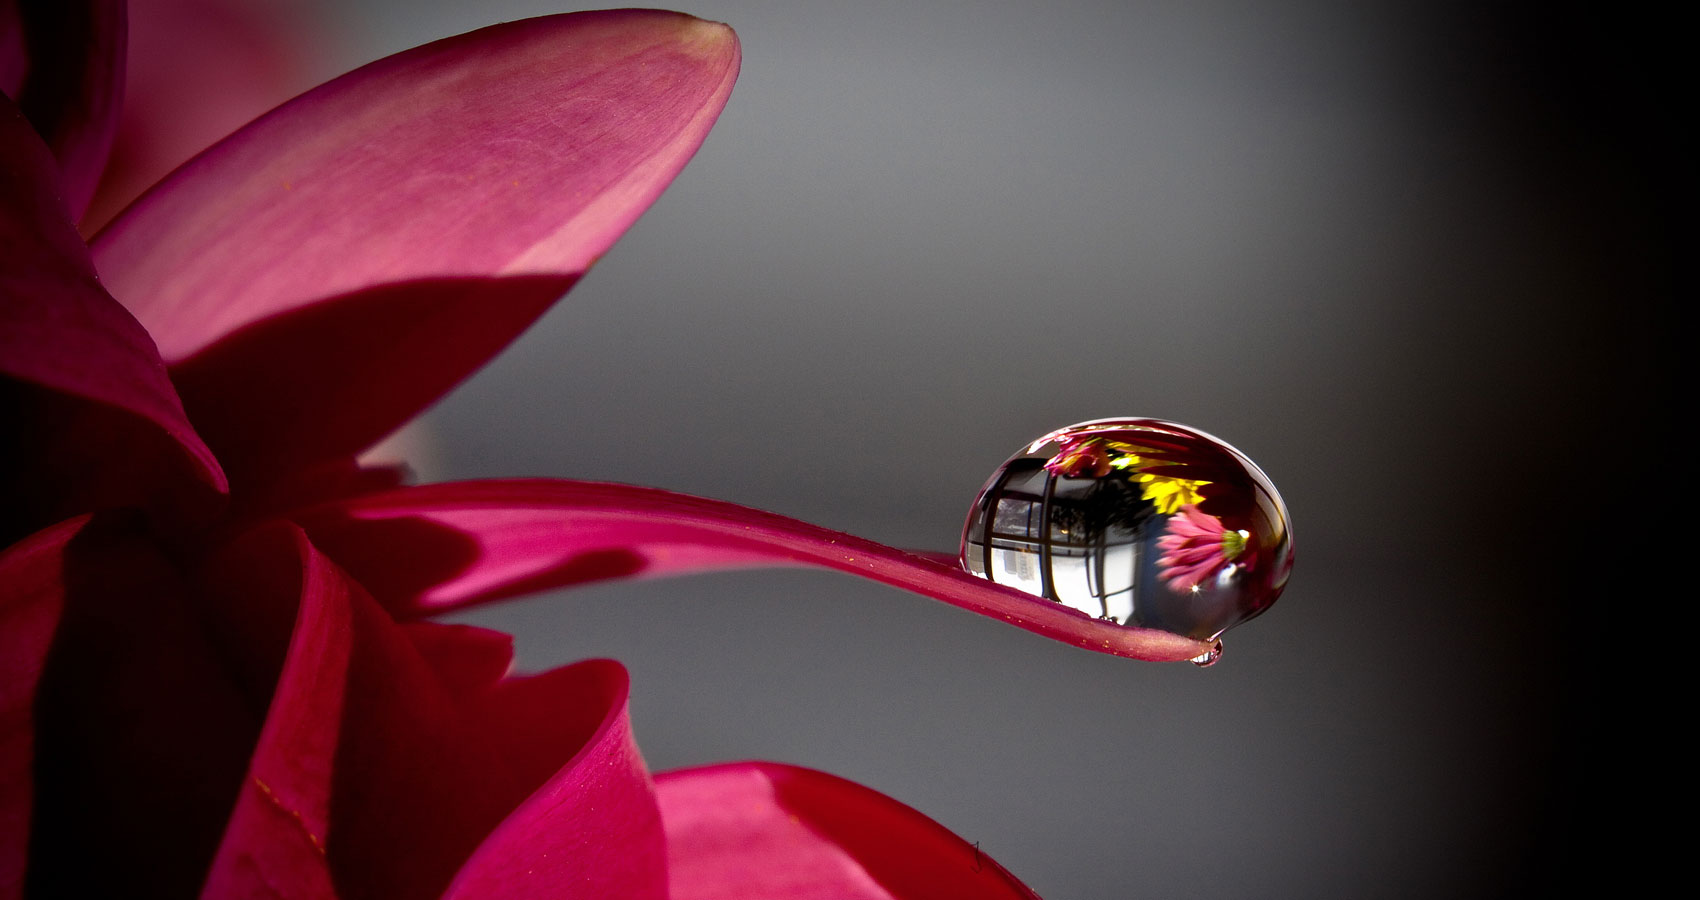 De Flower at Spillwords.com